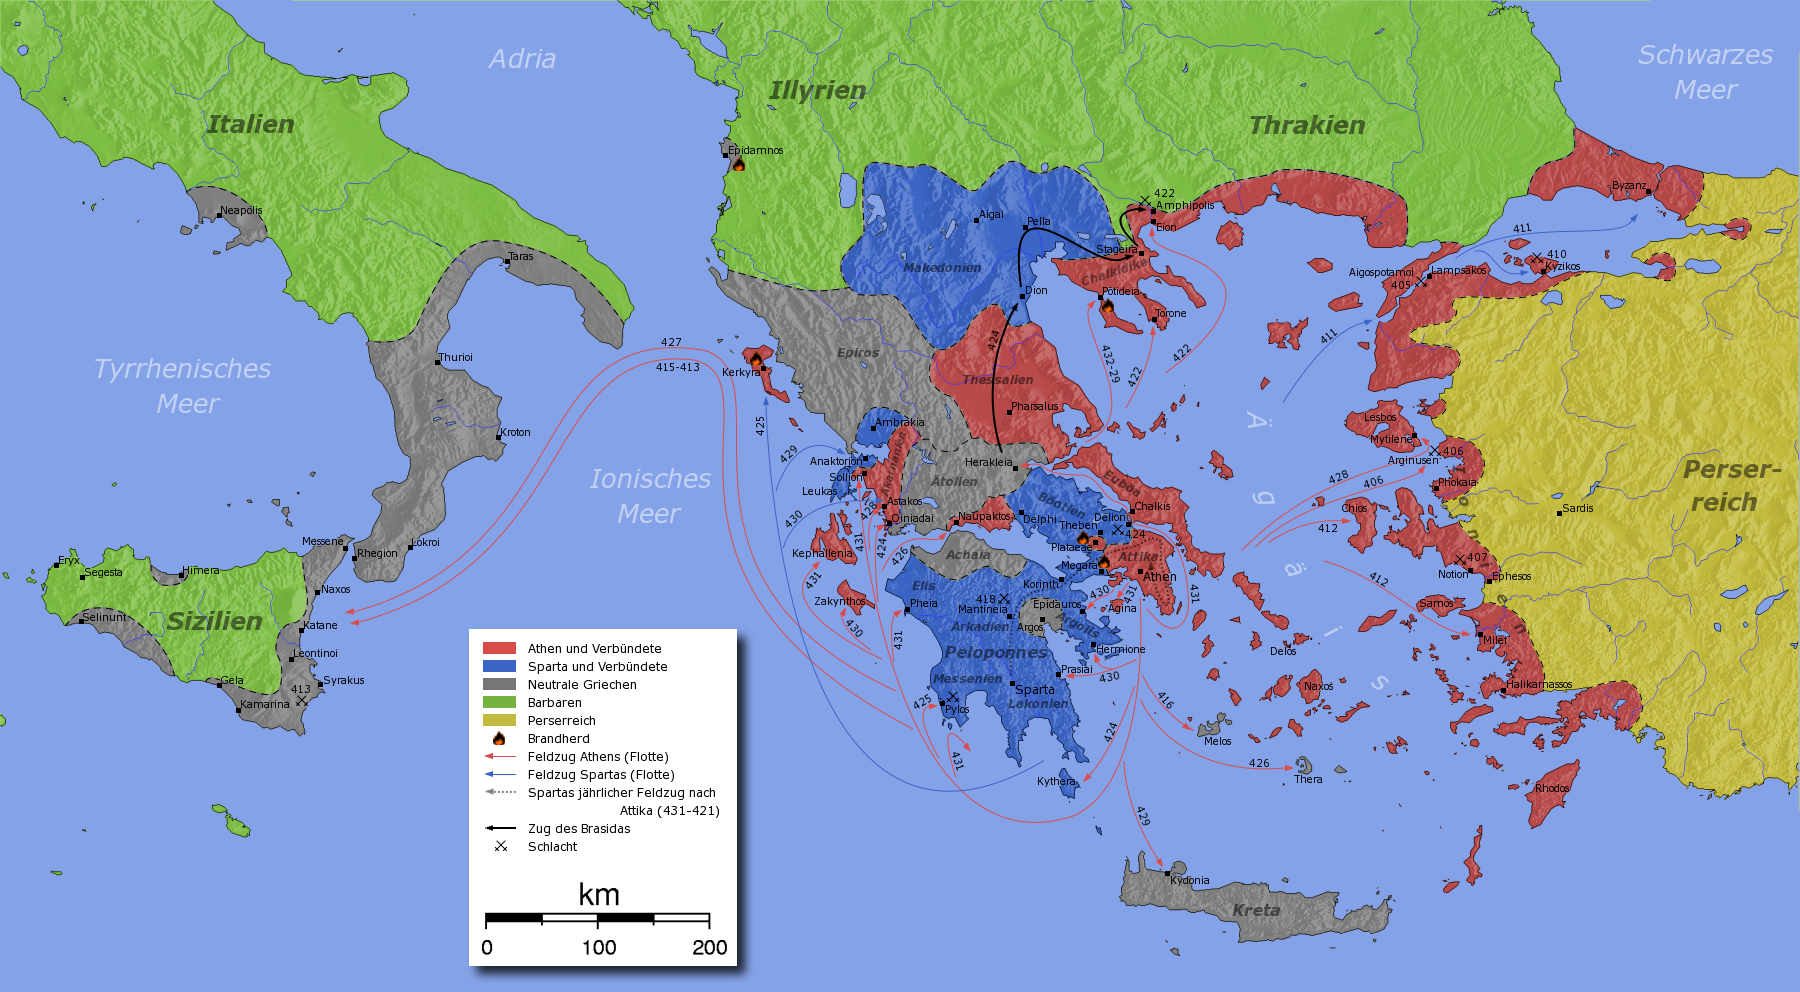 Karta Aten Grekland.Peloponnesiska Kriget Wikipedia